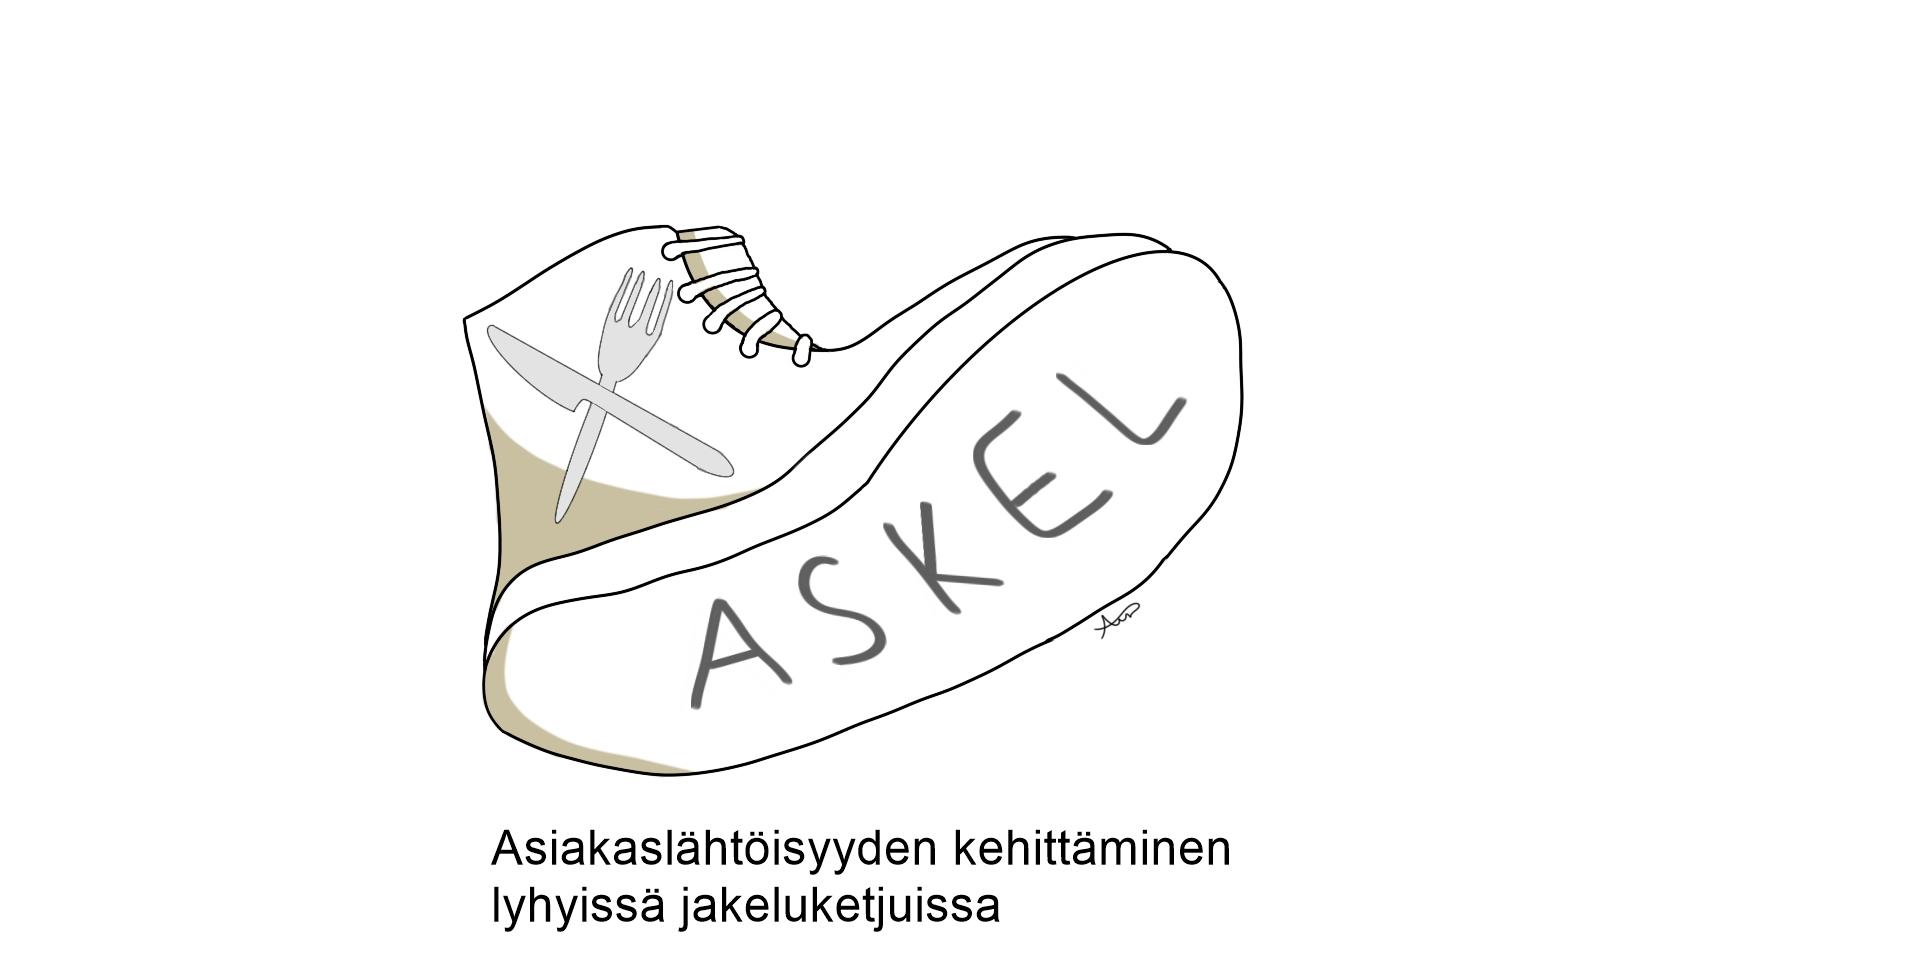 askel-hankkeen-logo-jpeg.jpg (189 KB)